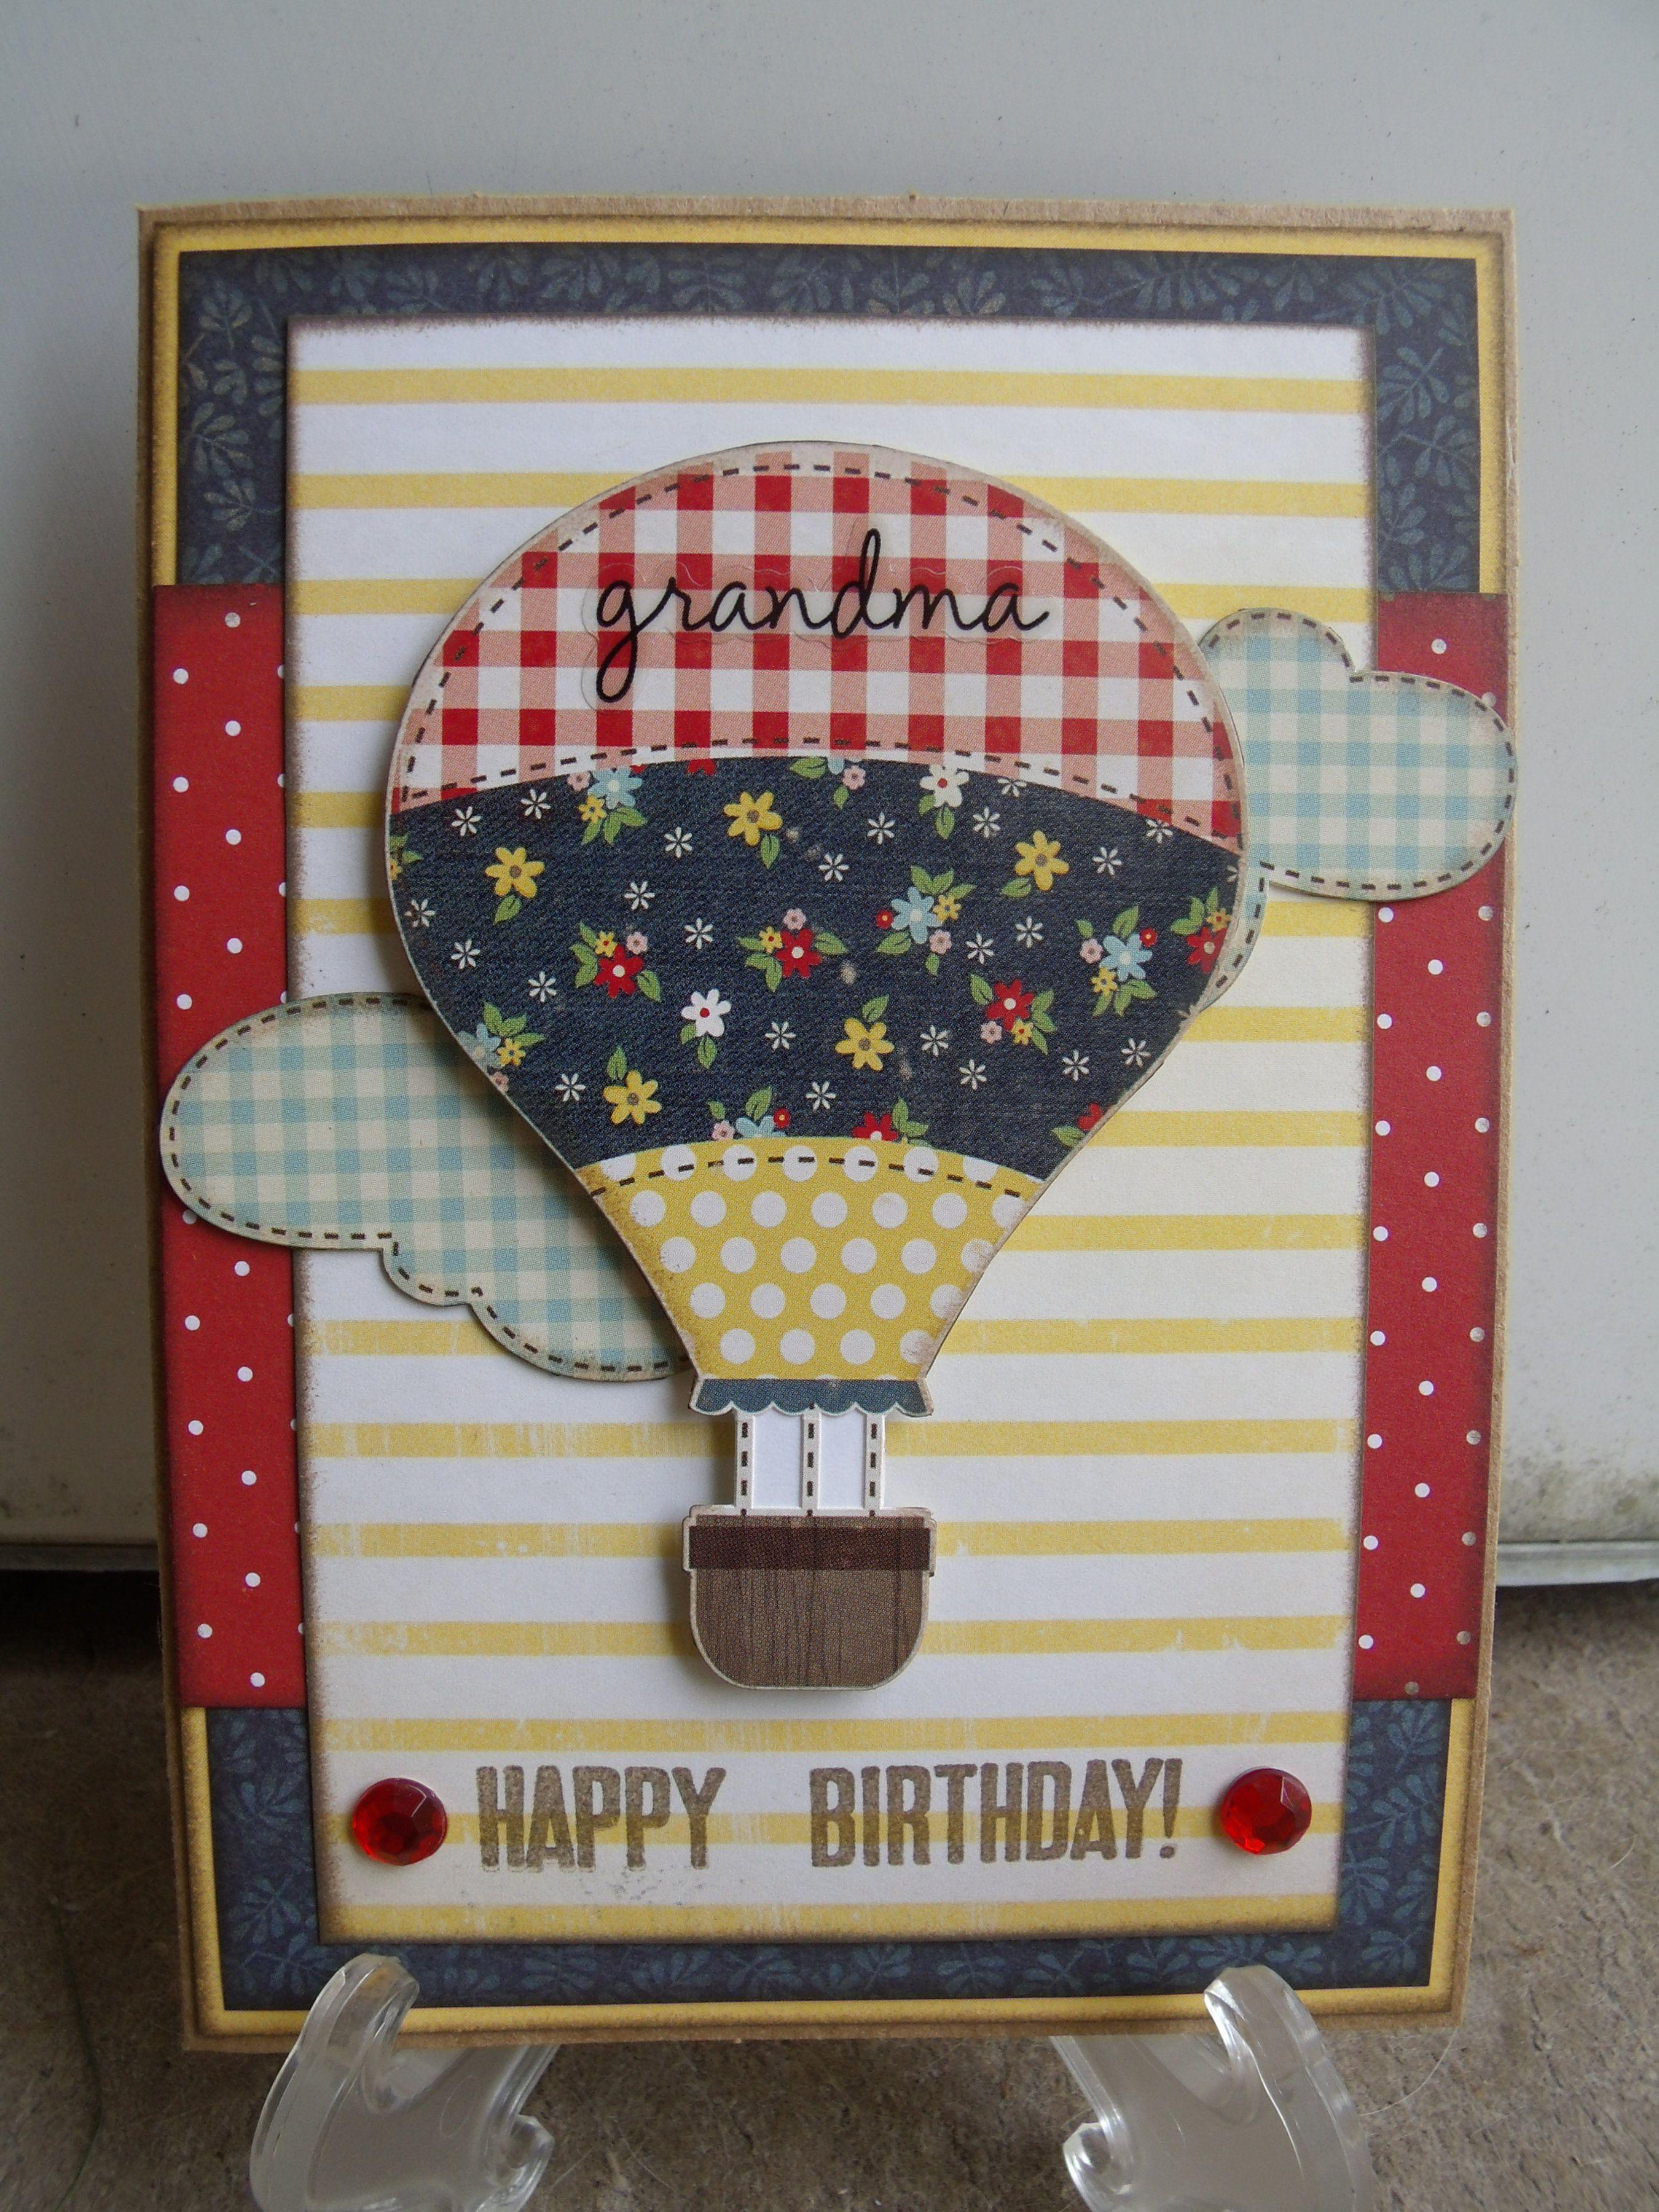 Grandma happy birthday scrapbook cards created by me